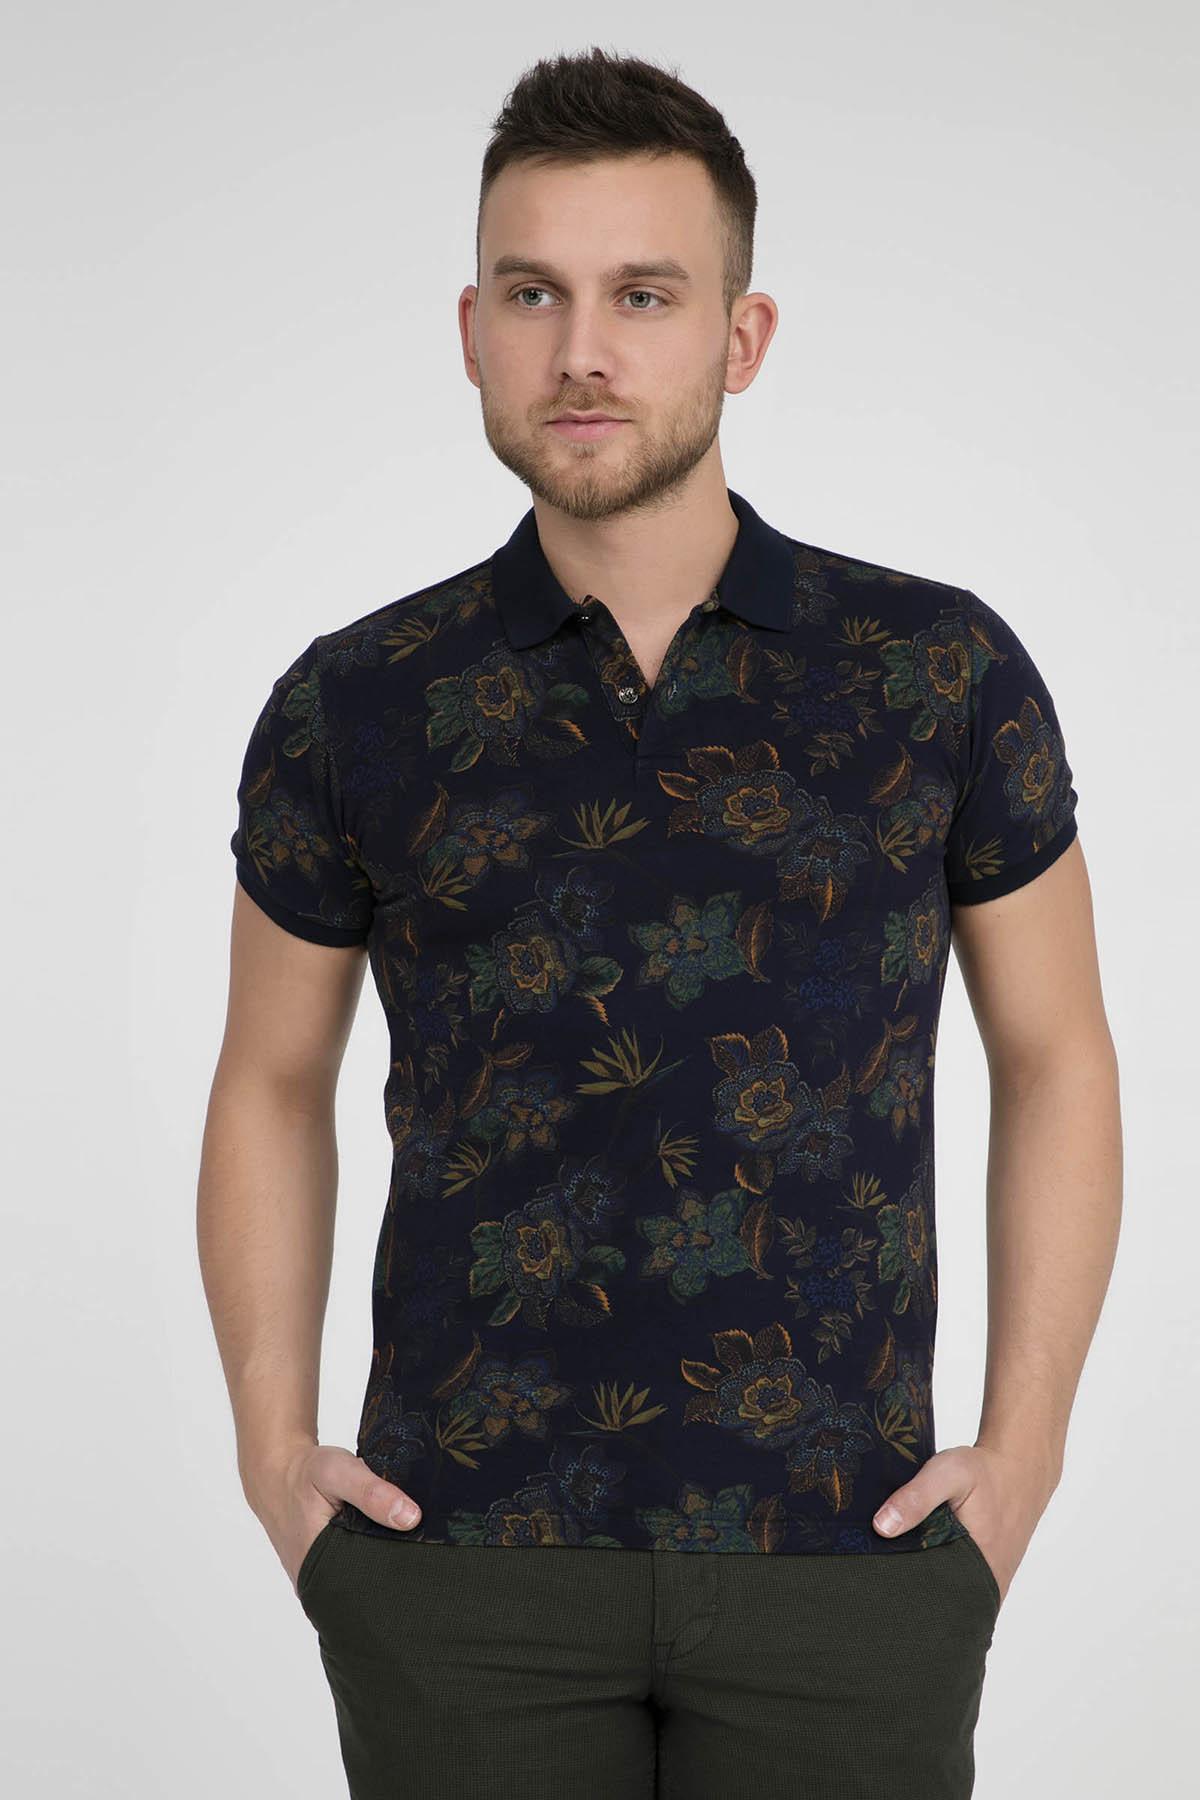 ETRO Erkek Lacivert T-Shirt 1Y040 4070 202 1